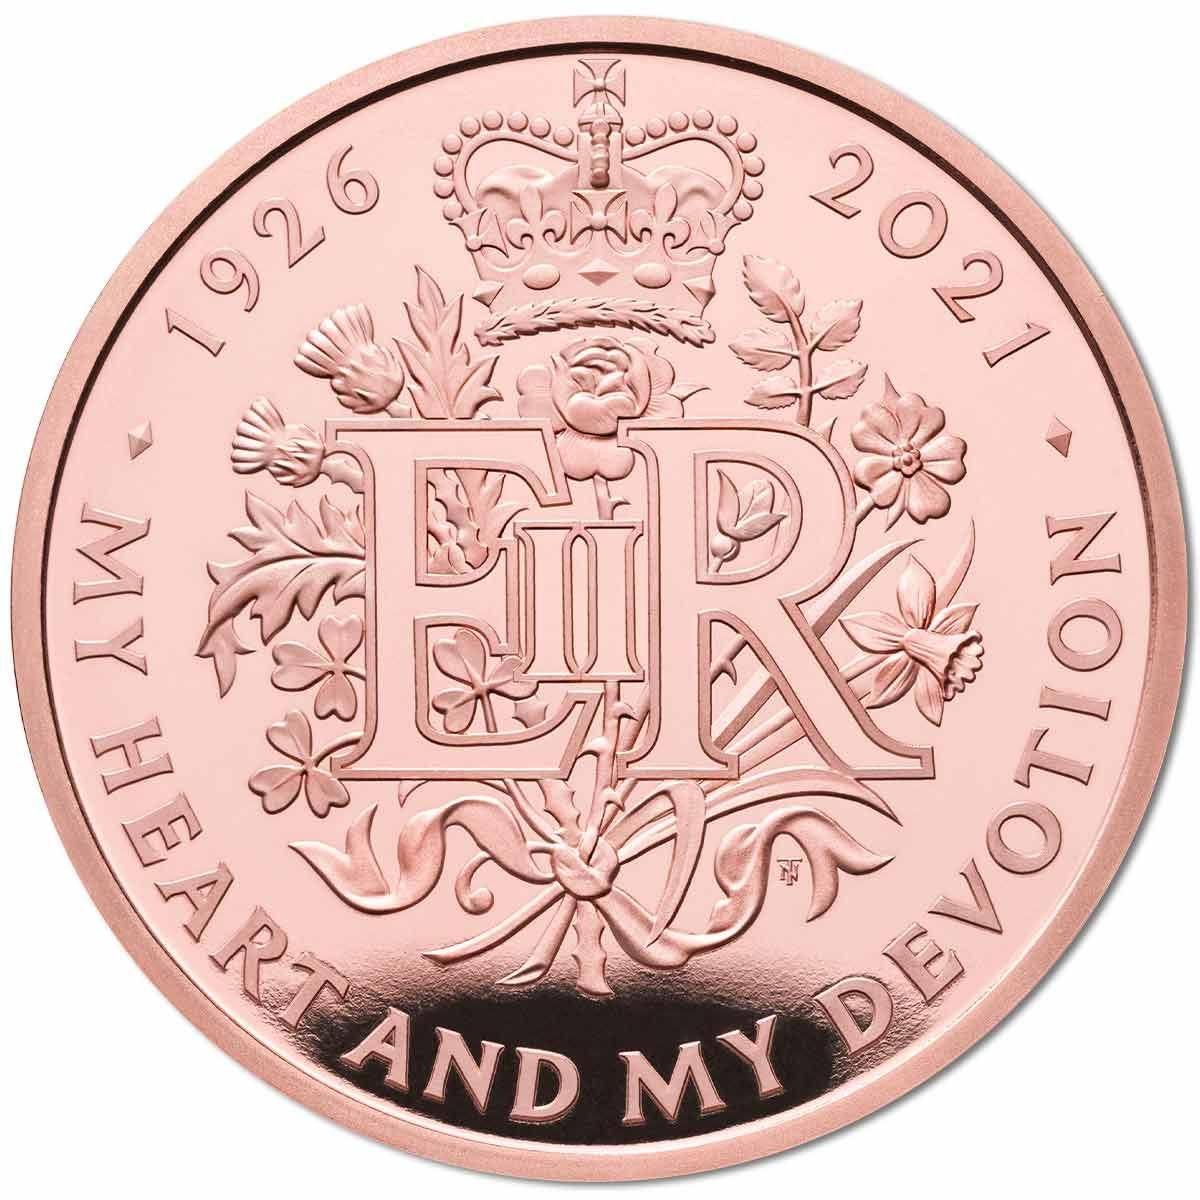 Queen Ellizabeth 95th Birthday coin gold proof 39,94gr Au - zvìtšit obrázek